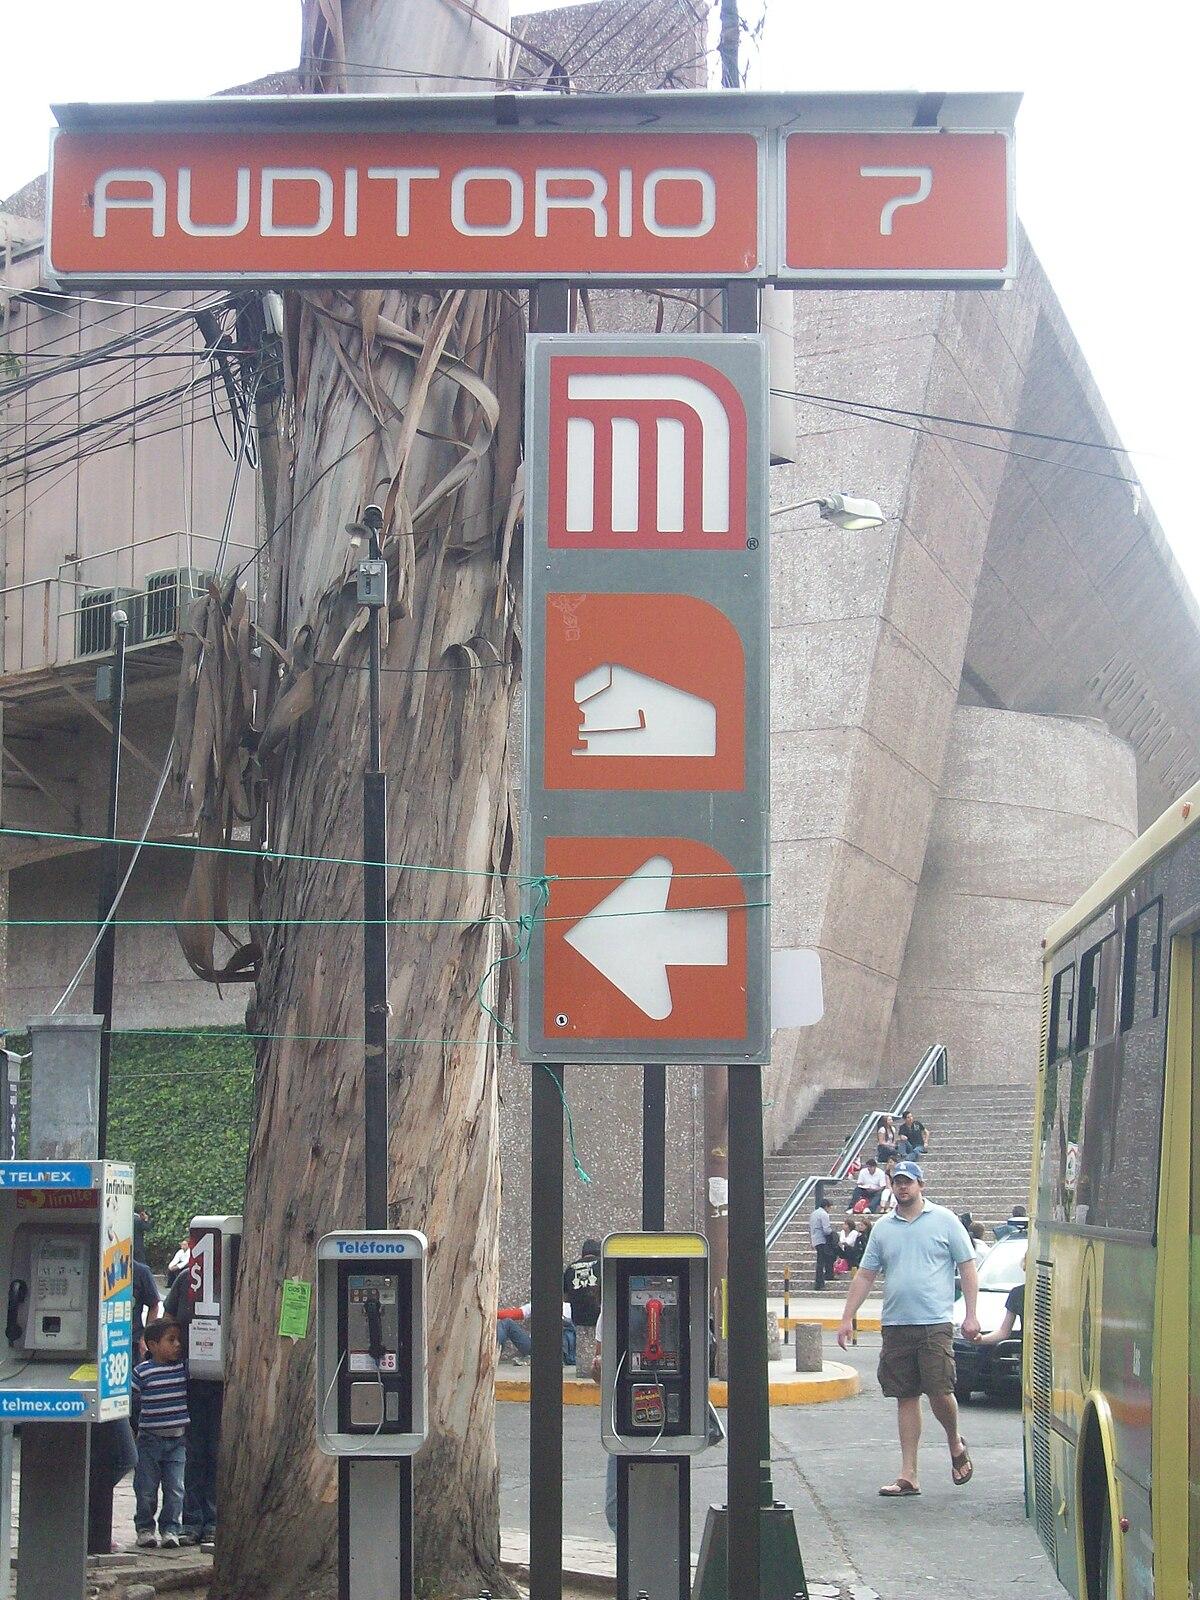 Metro Auditorio Wikidata